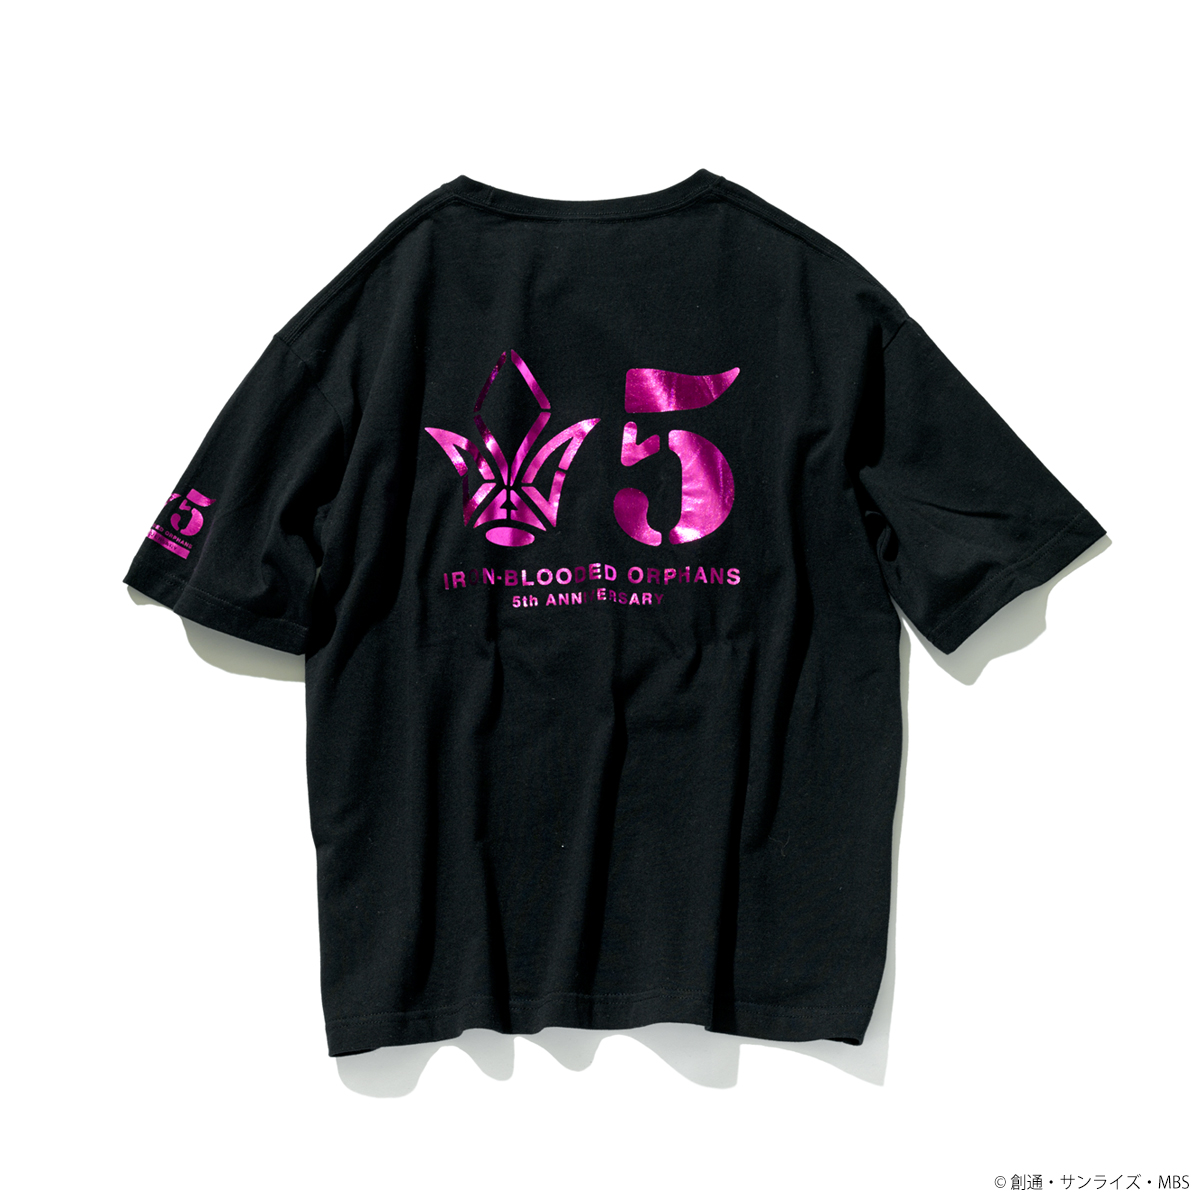 Ryusei-Go T-shirt—Mobile Suit Gundam IRON-BLOODED ORPHANS/STRICT-G Collaboration